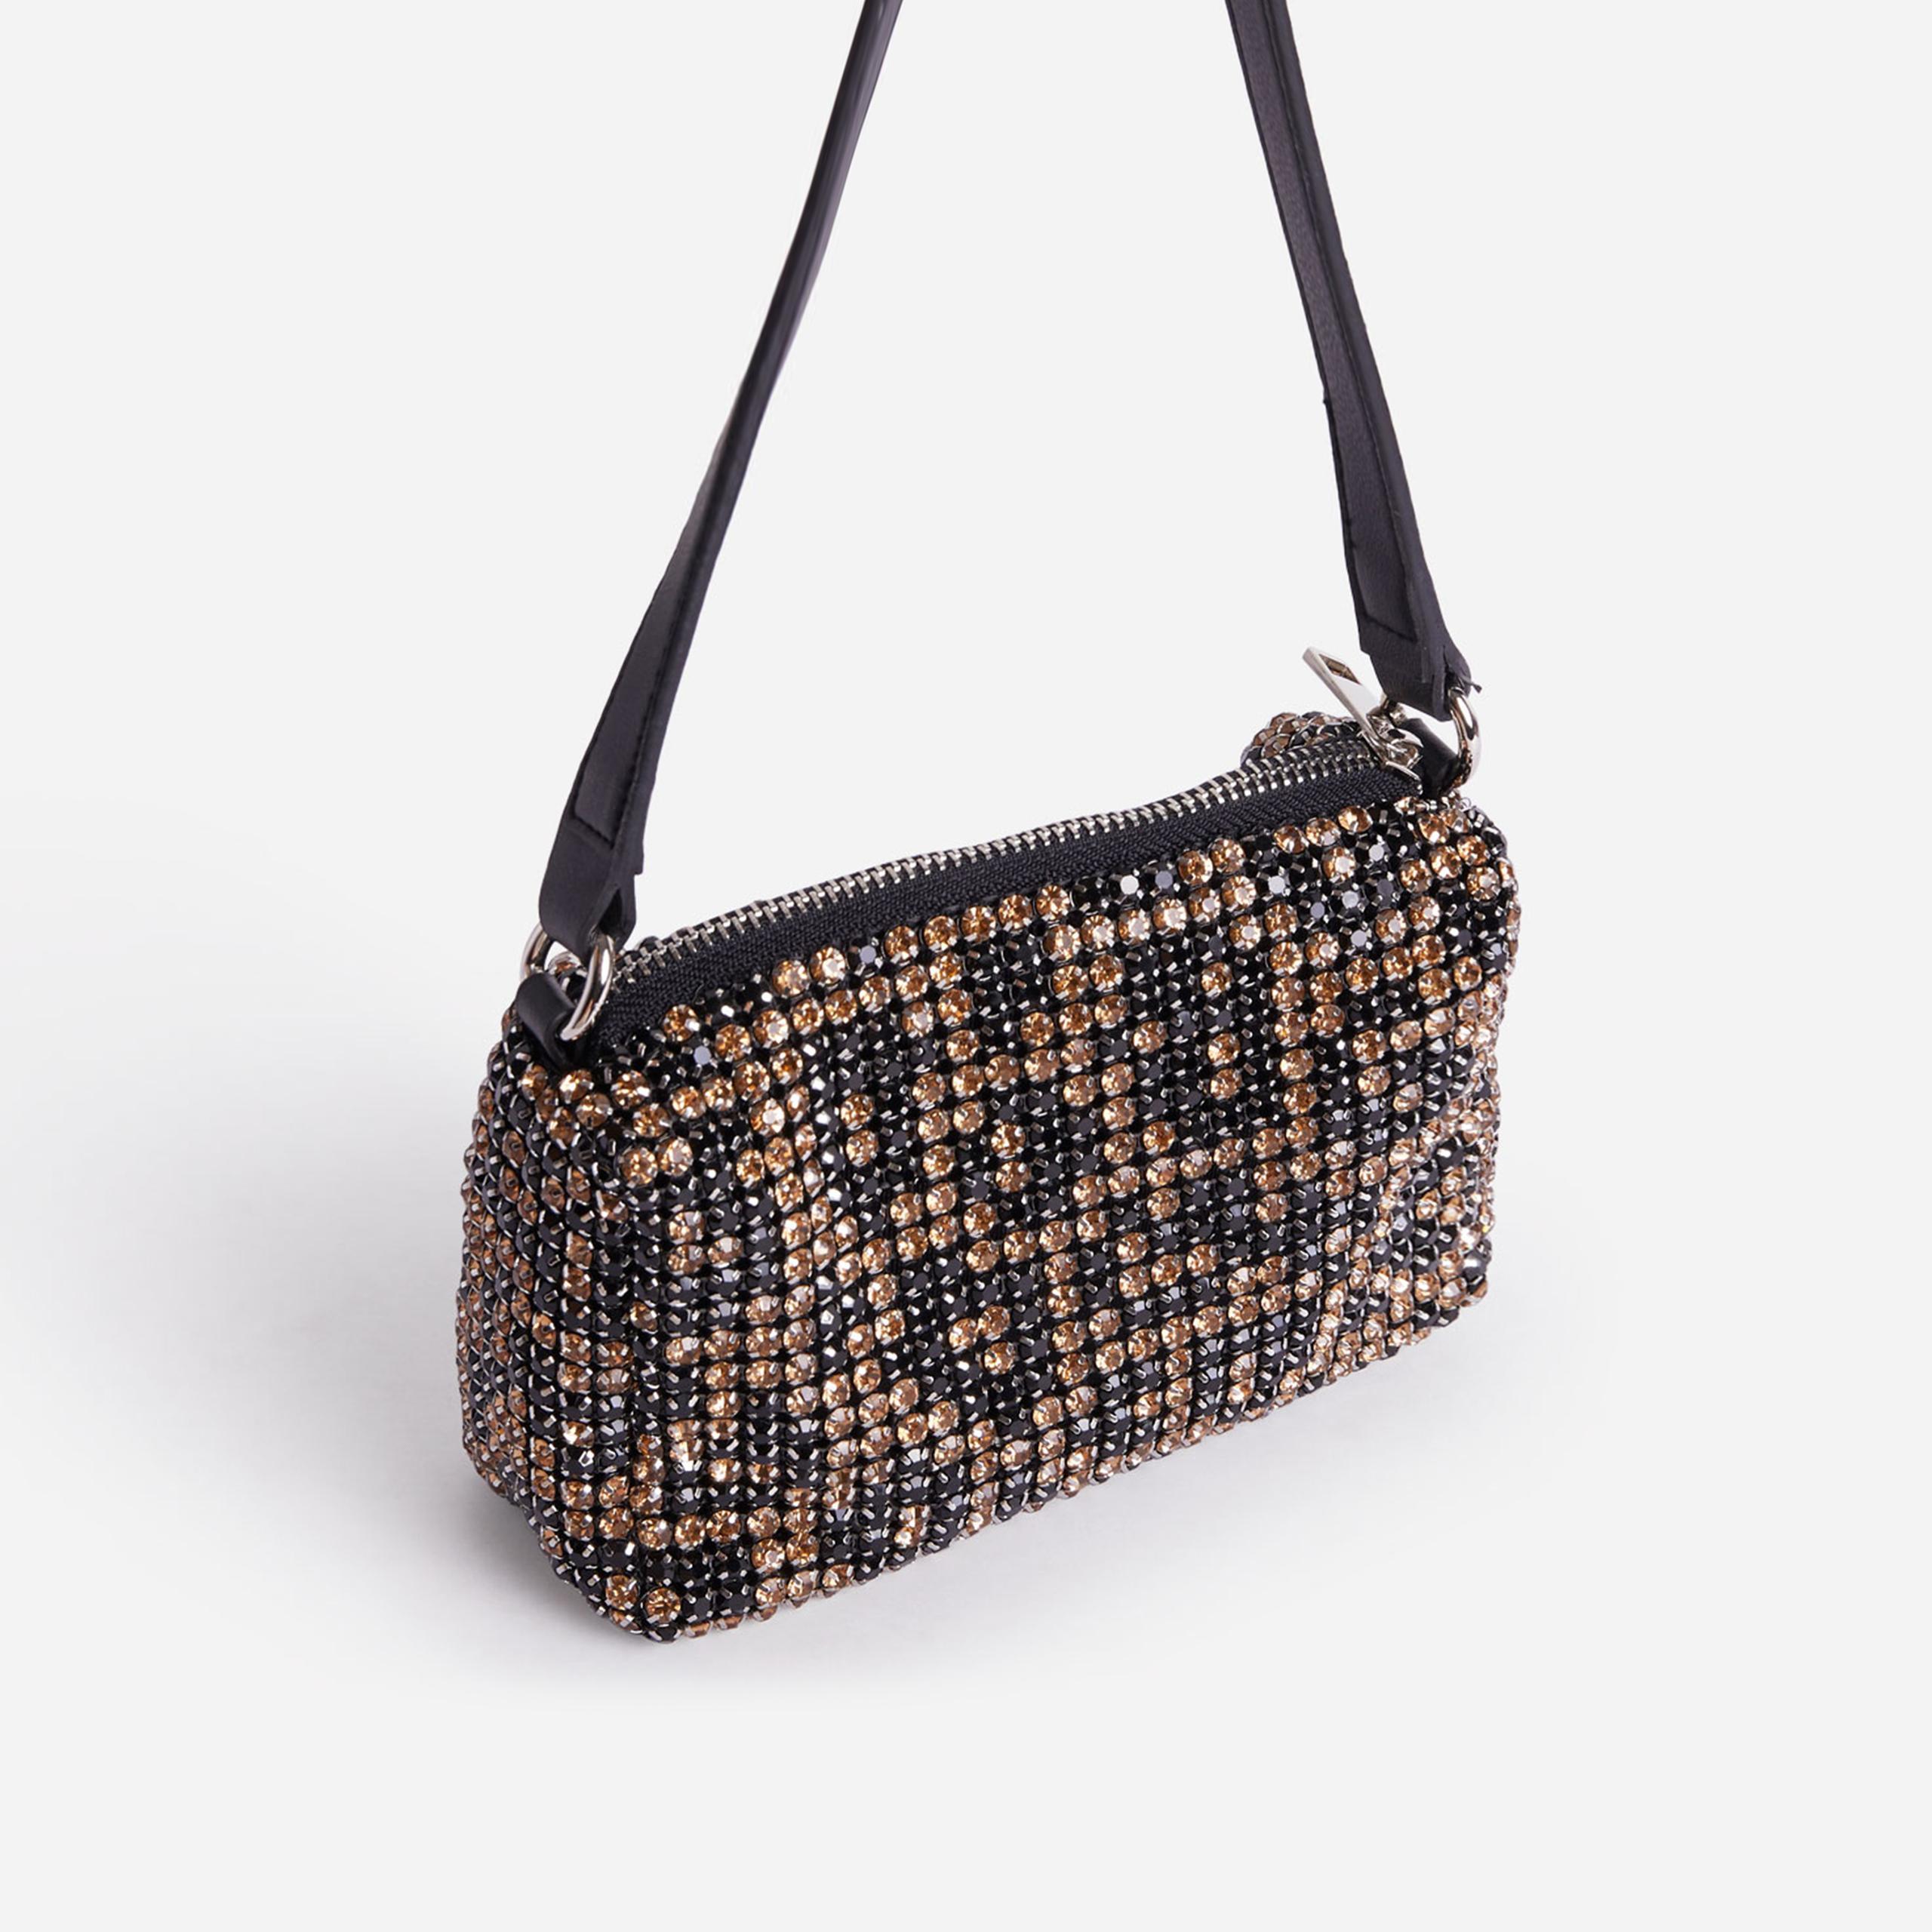 EGO Glitterball Shoulder Bag In Leopard Print Diamante,, Brown  - female - Size: One Size